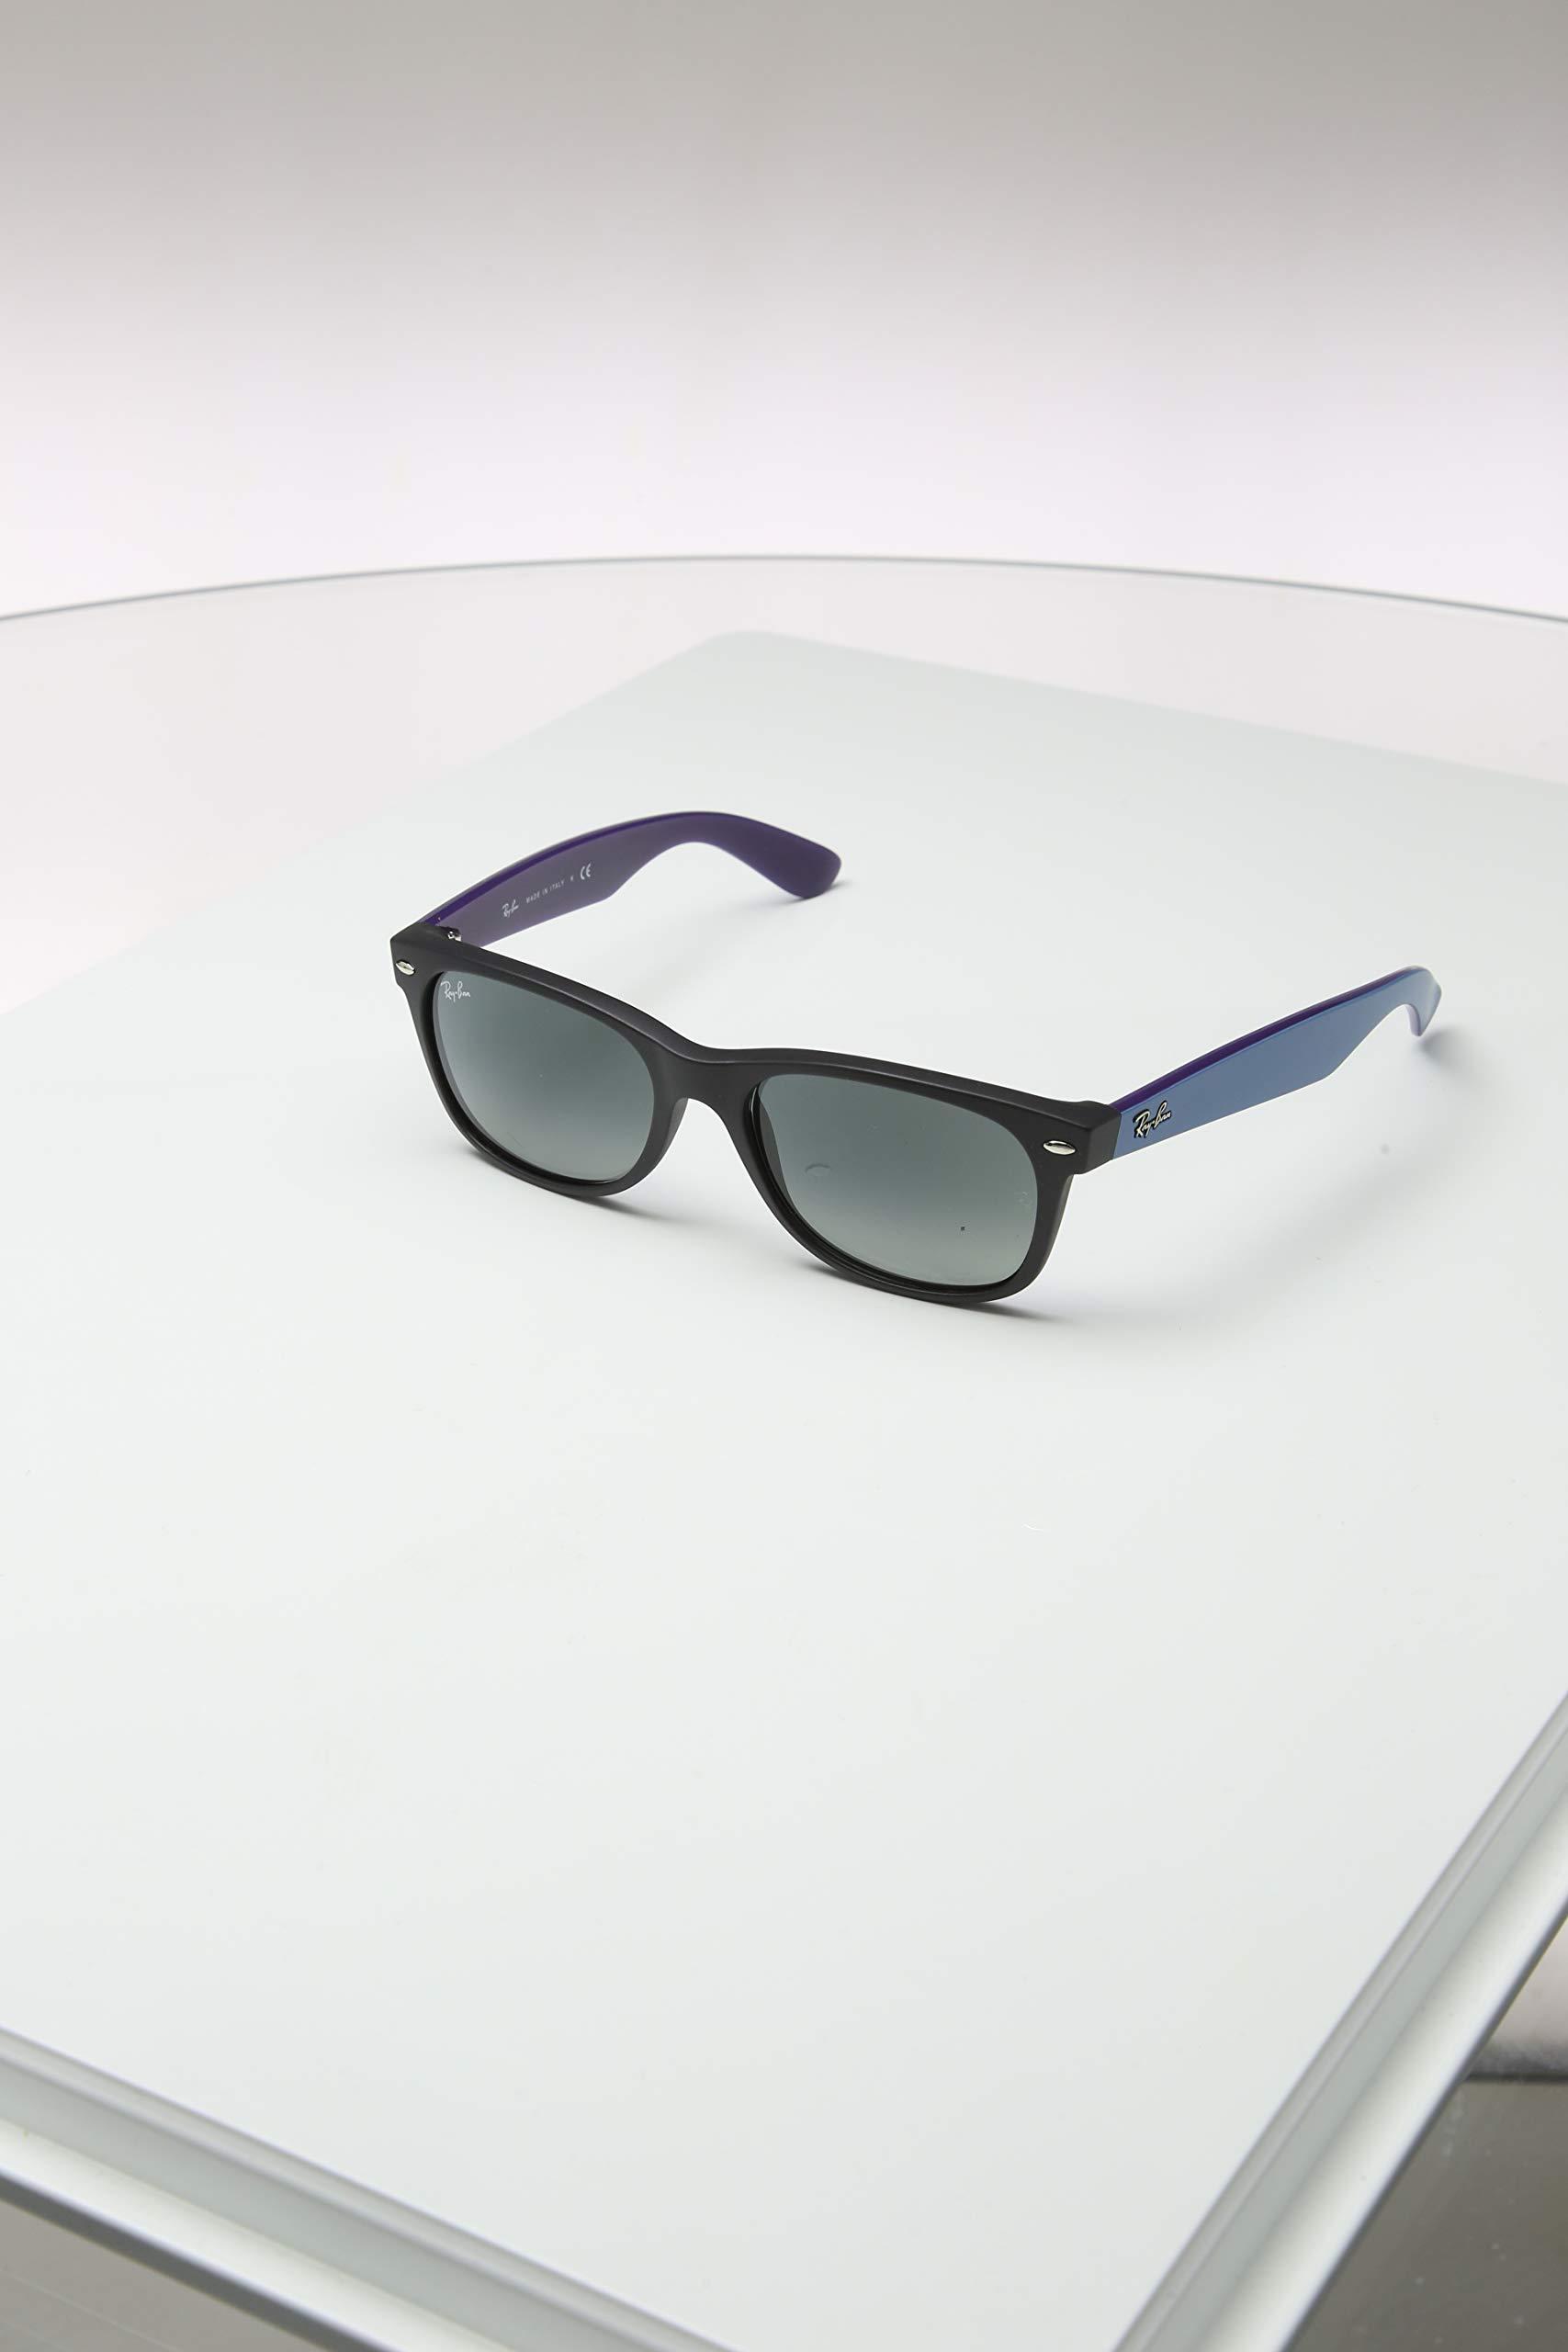 Ray-Ban RB2132 New Wayfarer Sunglasses, Matte Black/Grey Gradient, 55 mm by Ray-Ban